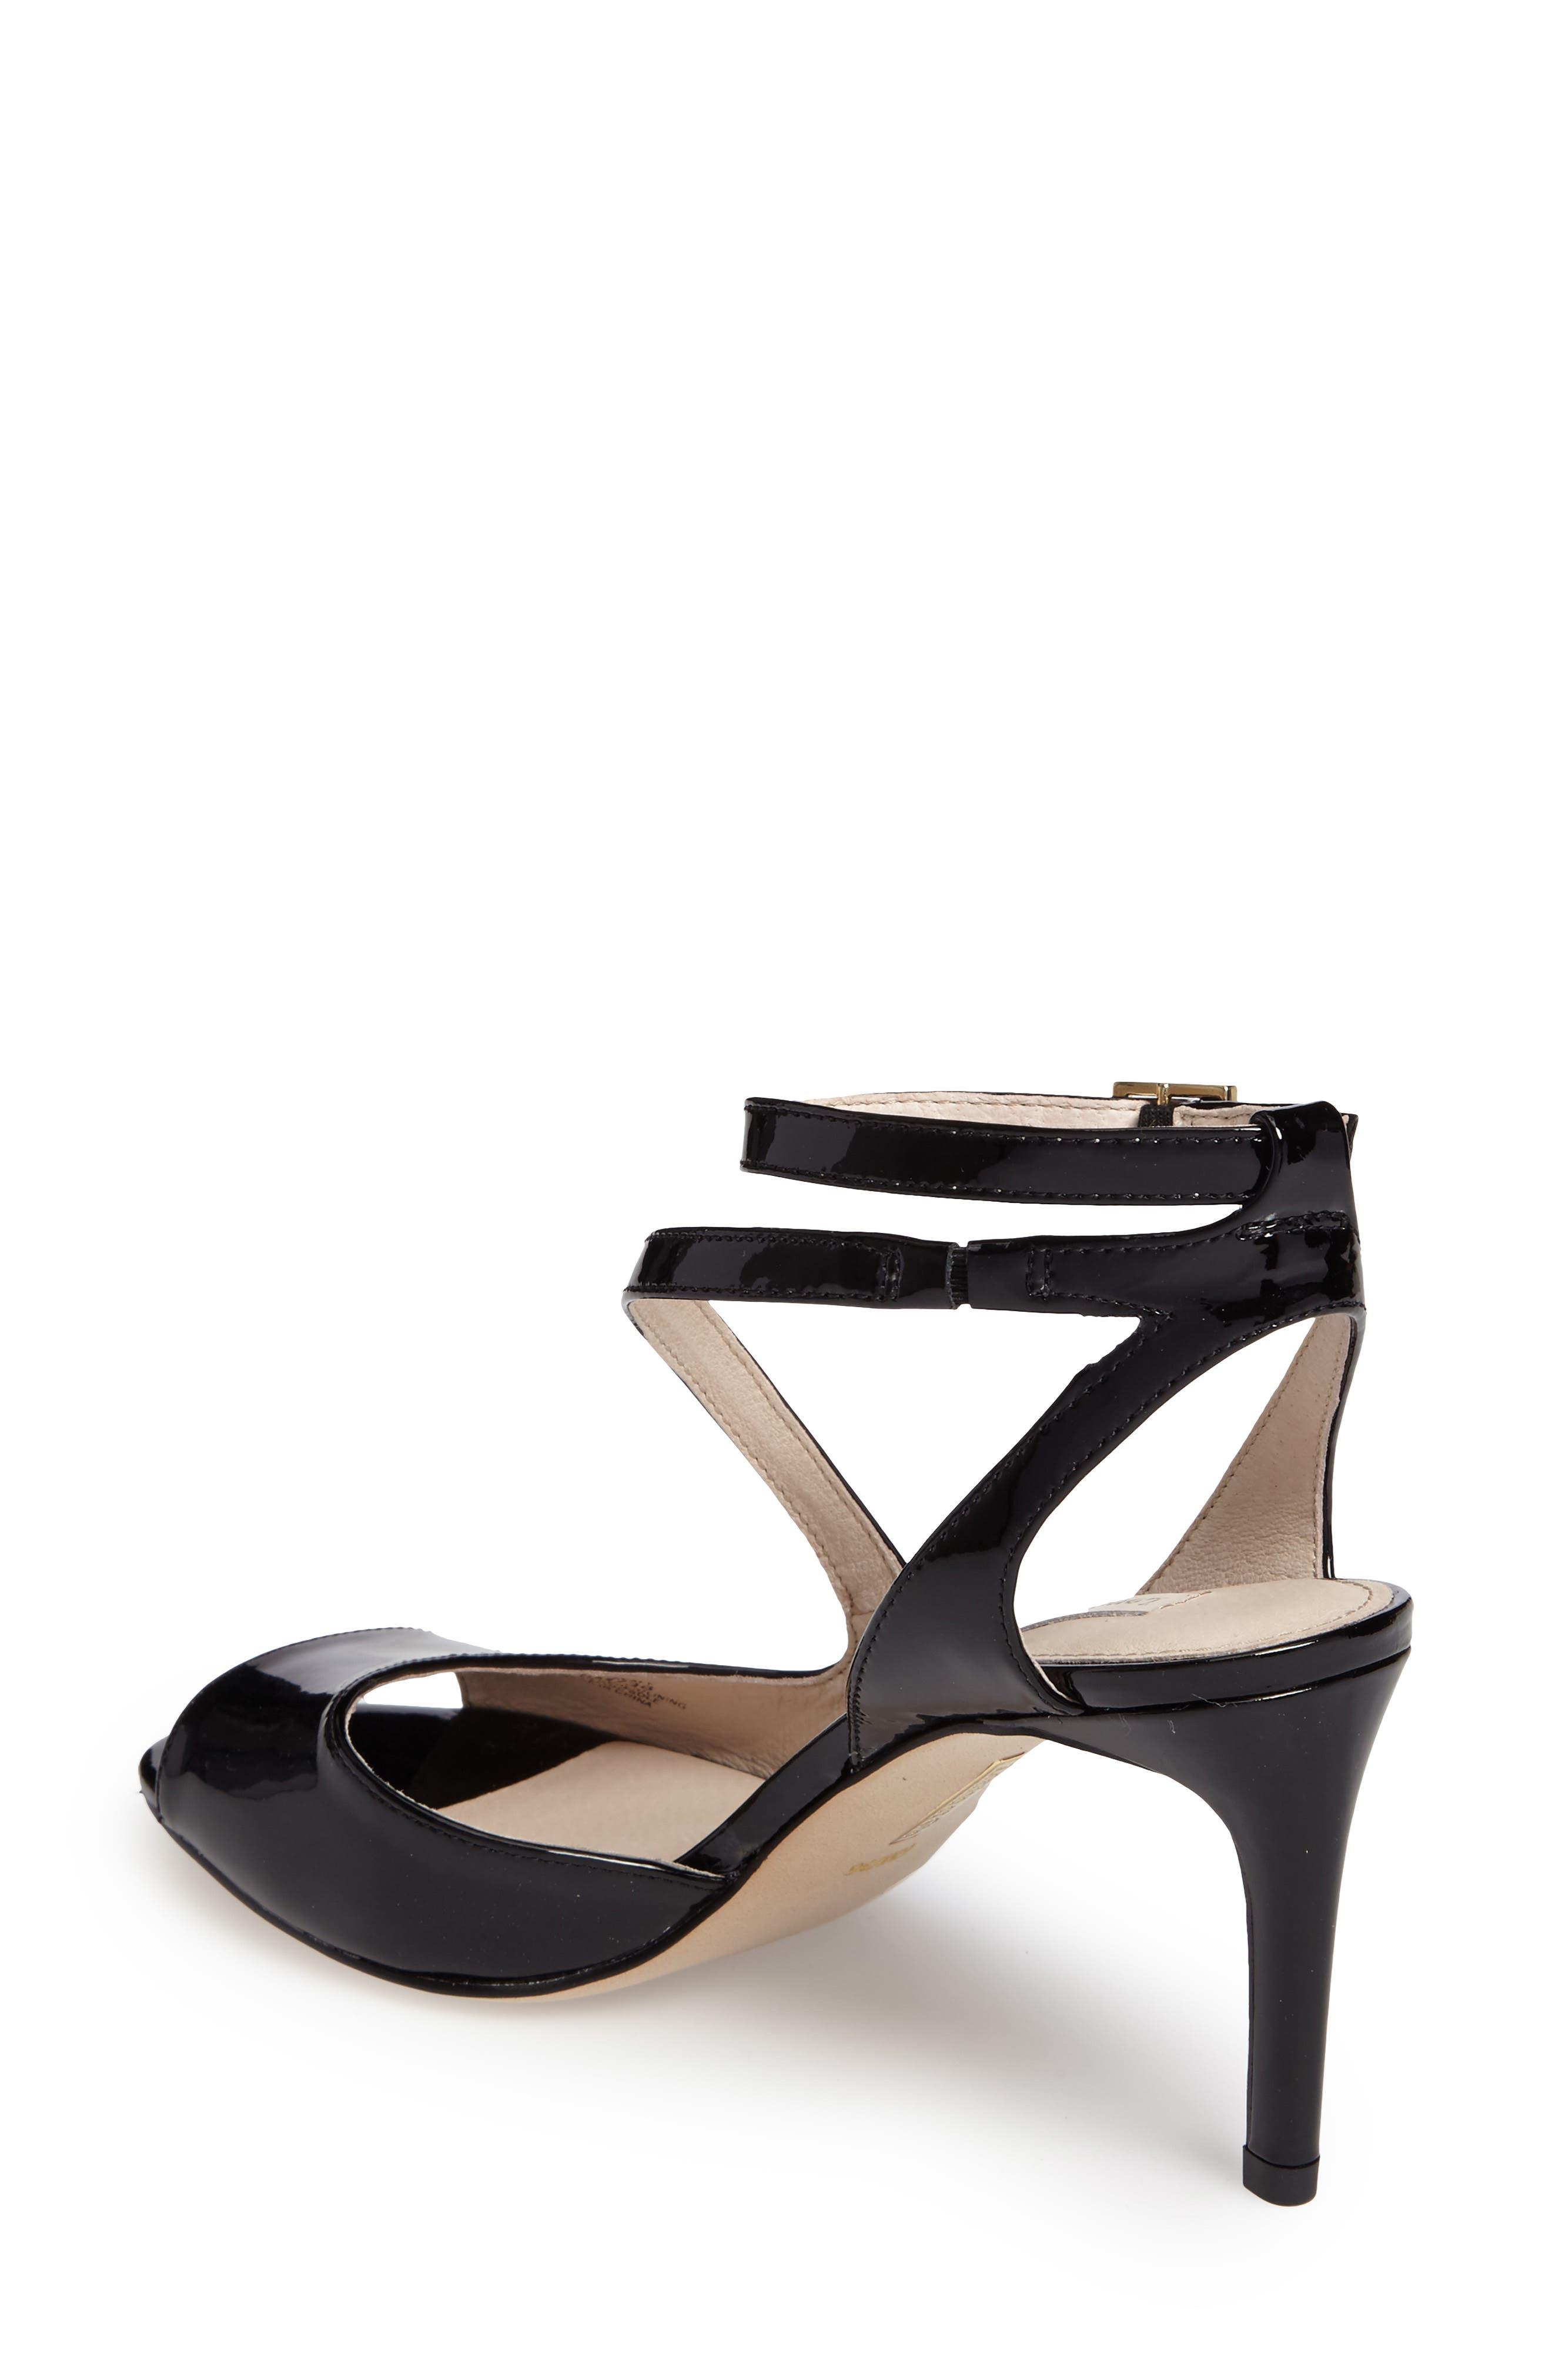 Kealy Asymmetrical Strappy Sandal,                             Alternate thumbnail 2, color,                             003